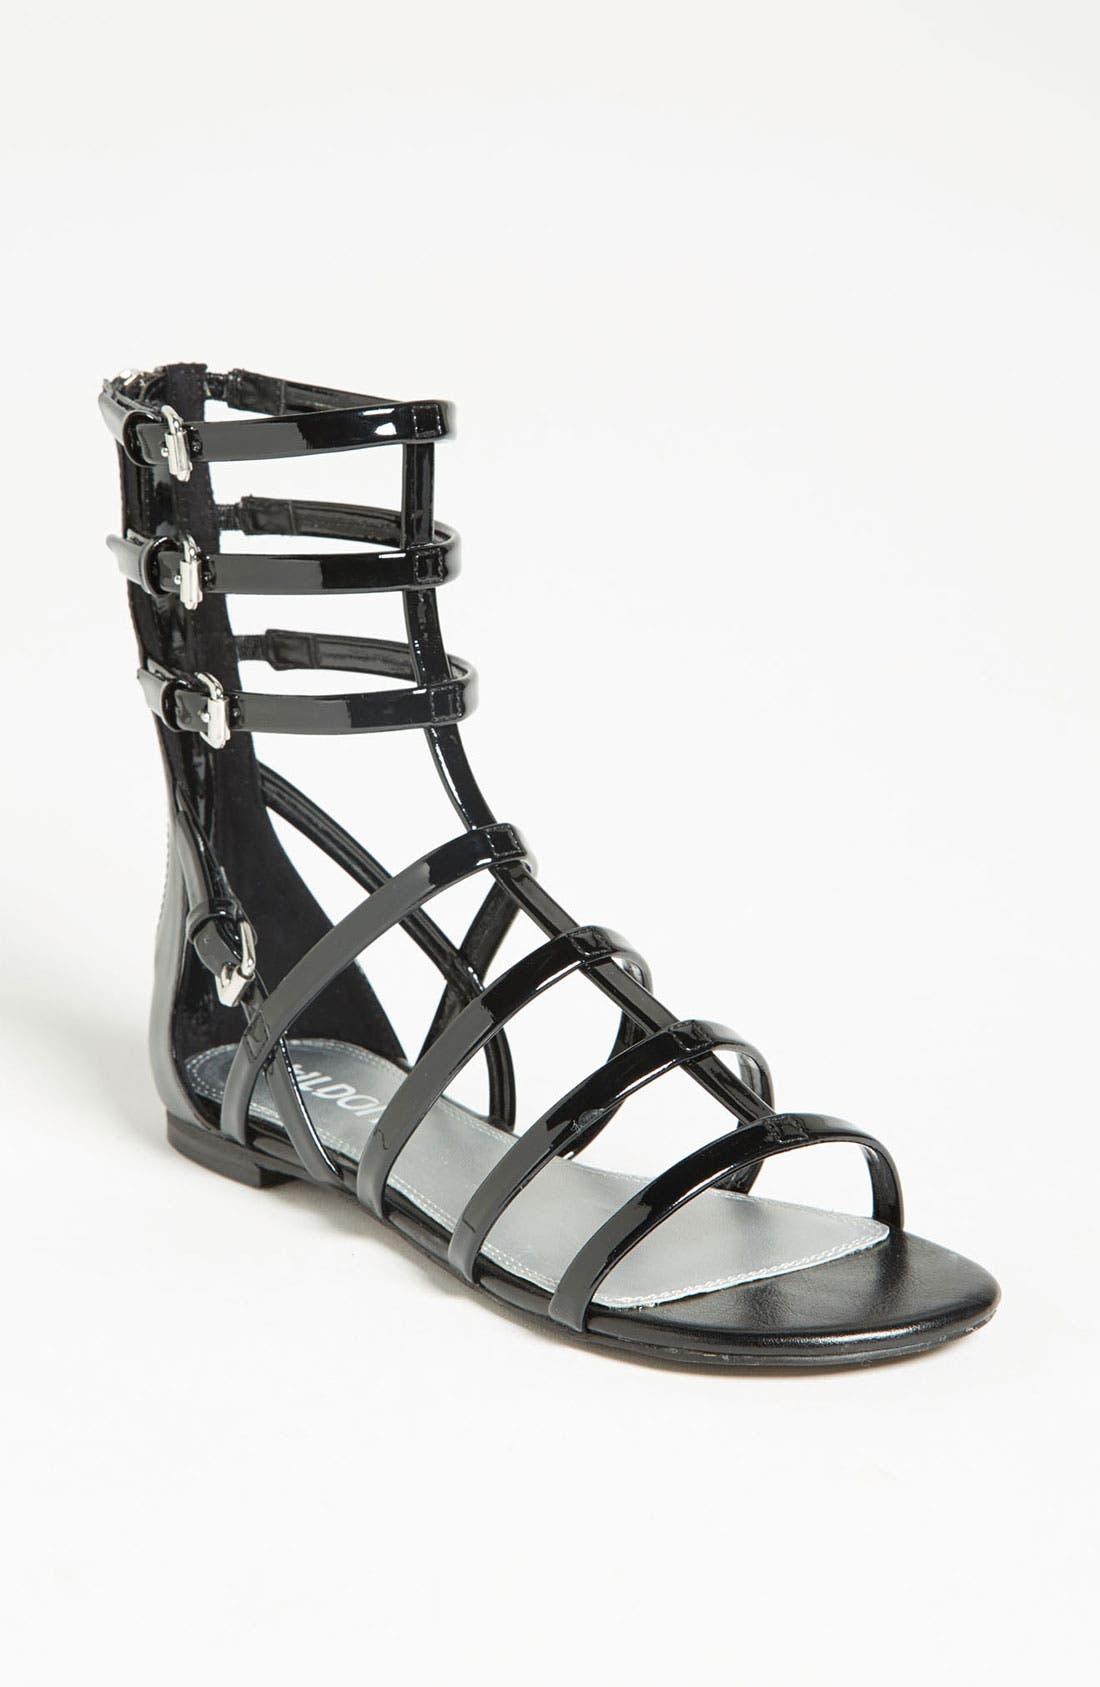 Main Image - Tildon 'Sarasota' Sandal